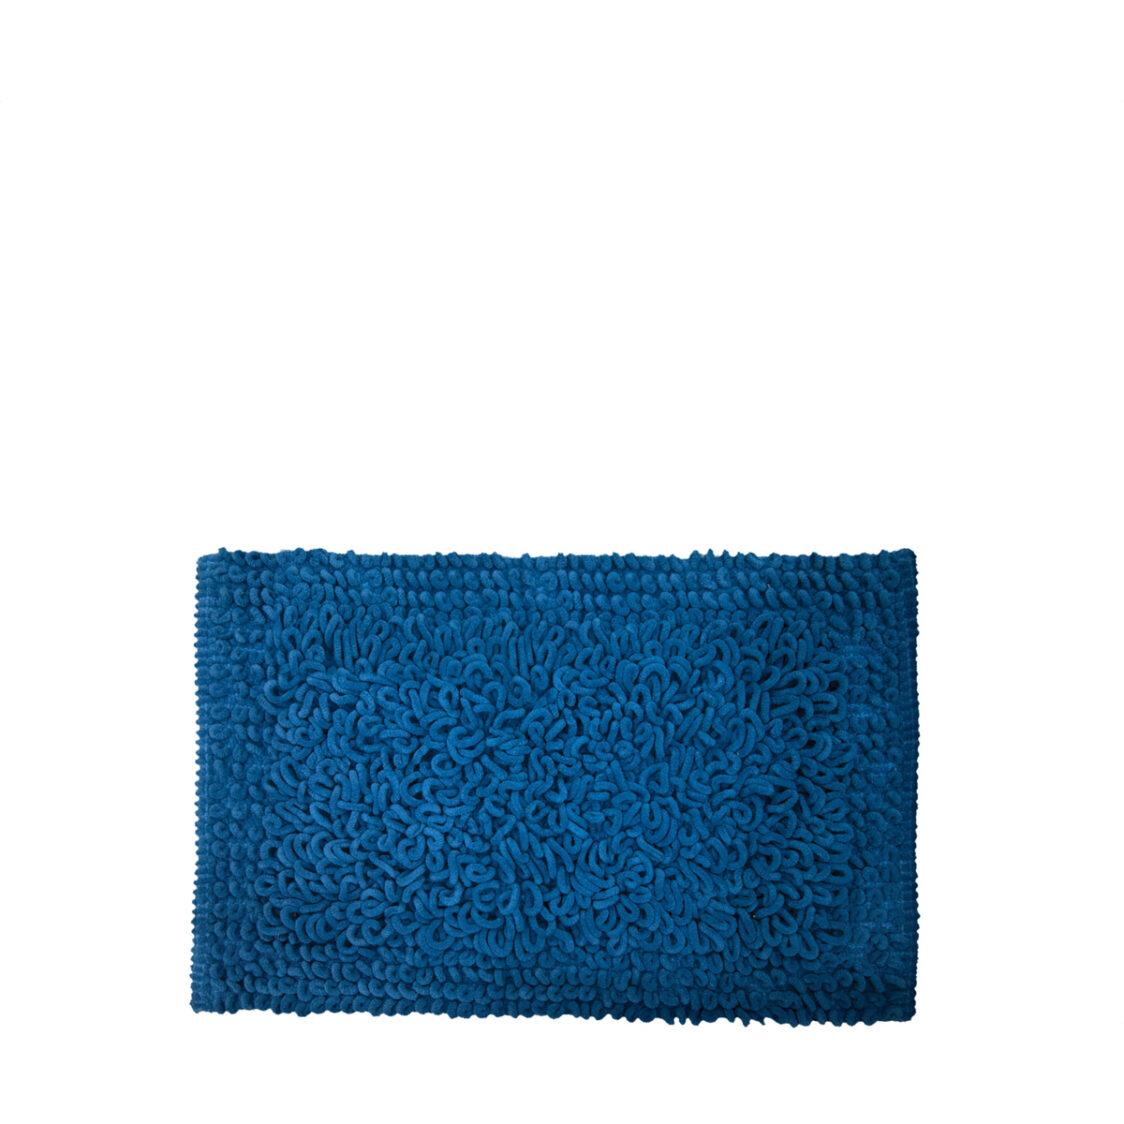 Charles Millen Suite Collection PRIM 18-352 - Denim 100 Microfibre Anti-Slip Bath Mat